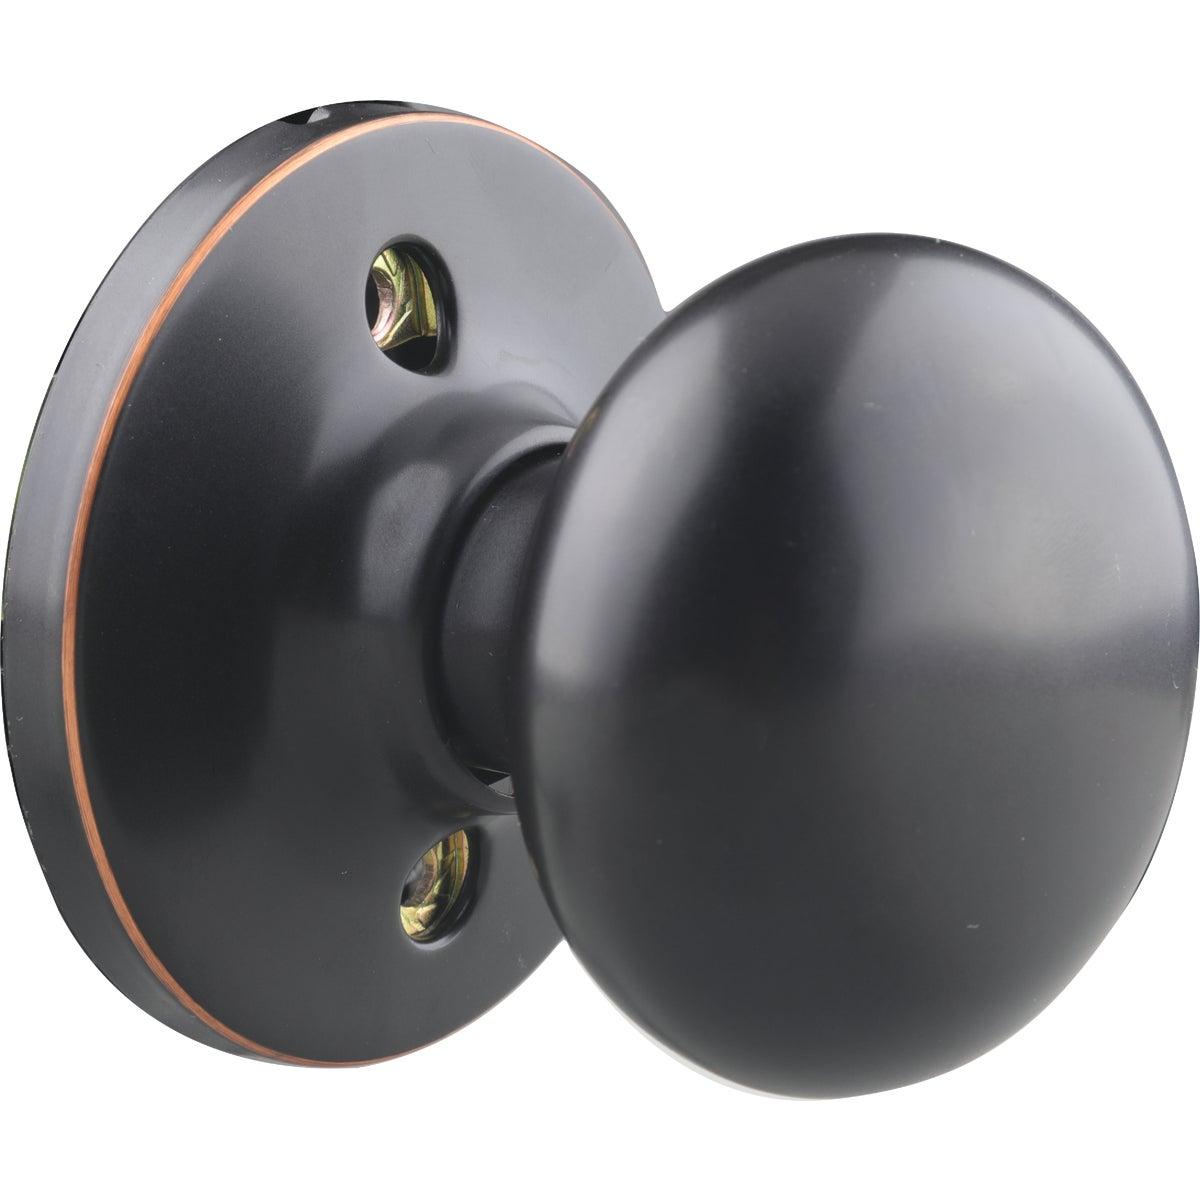 Steel Pro ORB CP 1/2RND DUMMY LOCK 5287ORB-DMY CP